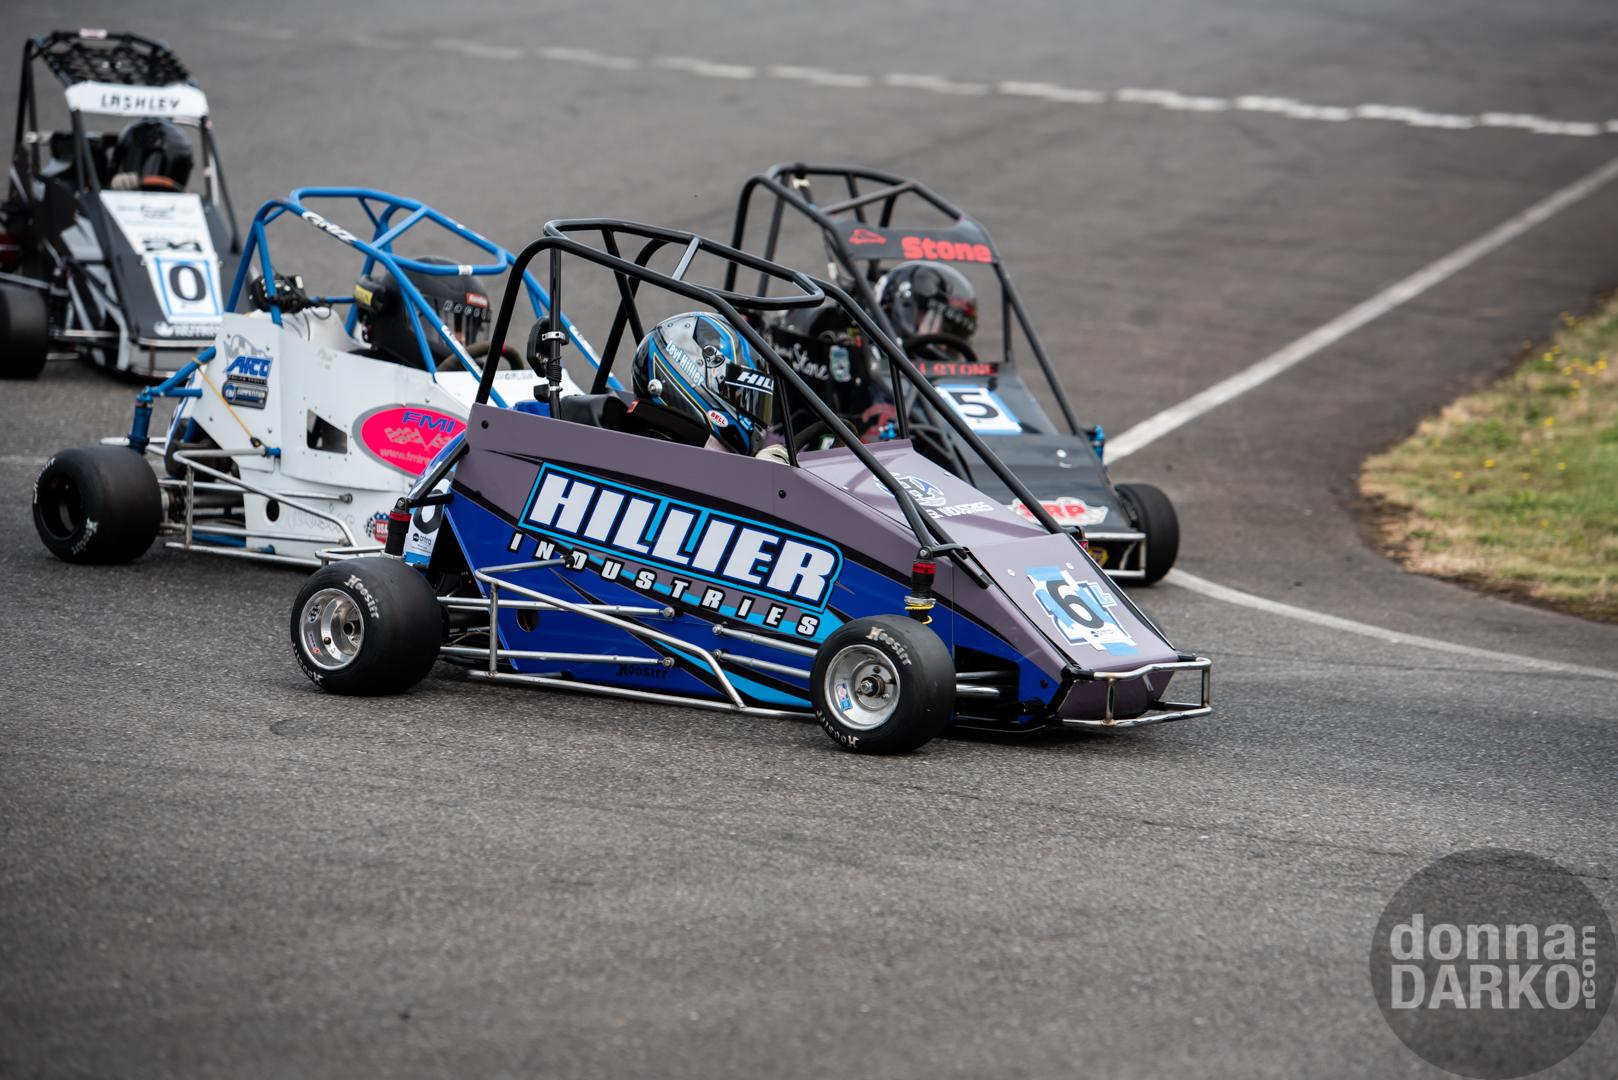 QWMA (Racing) 8-11-2019 DSC_7535.jpg